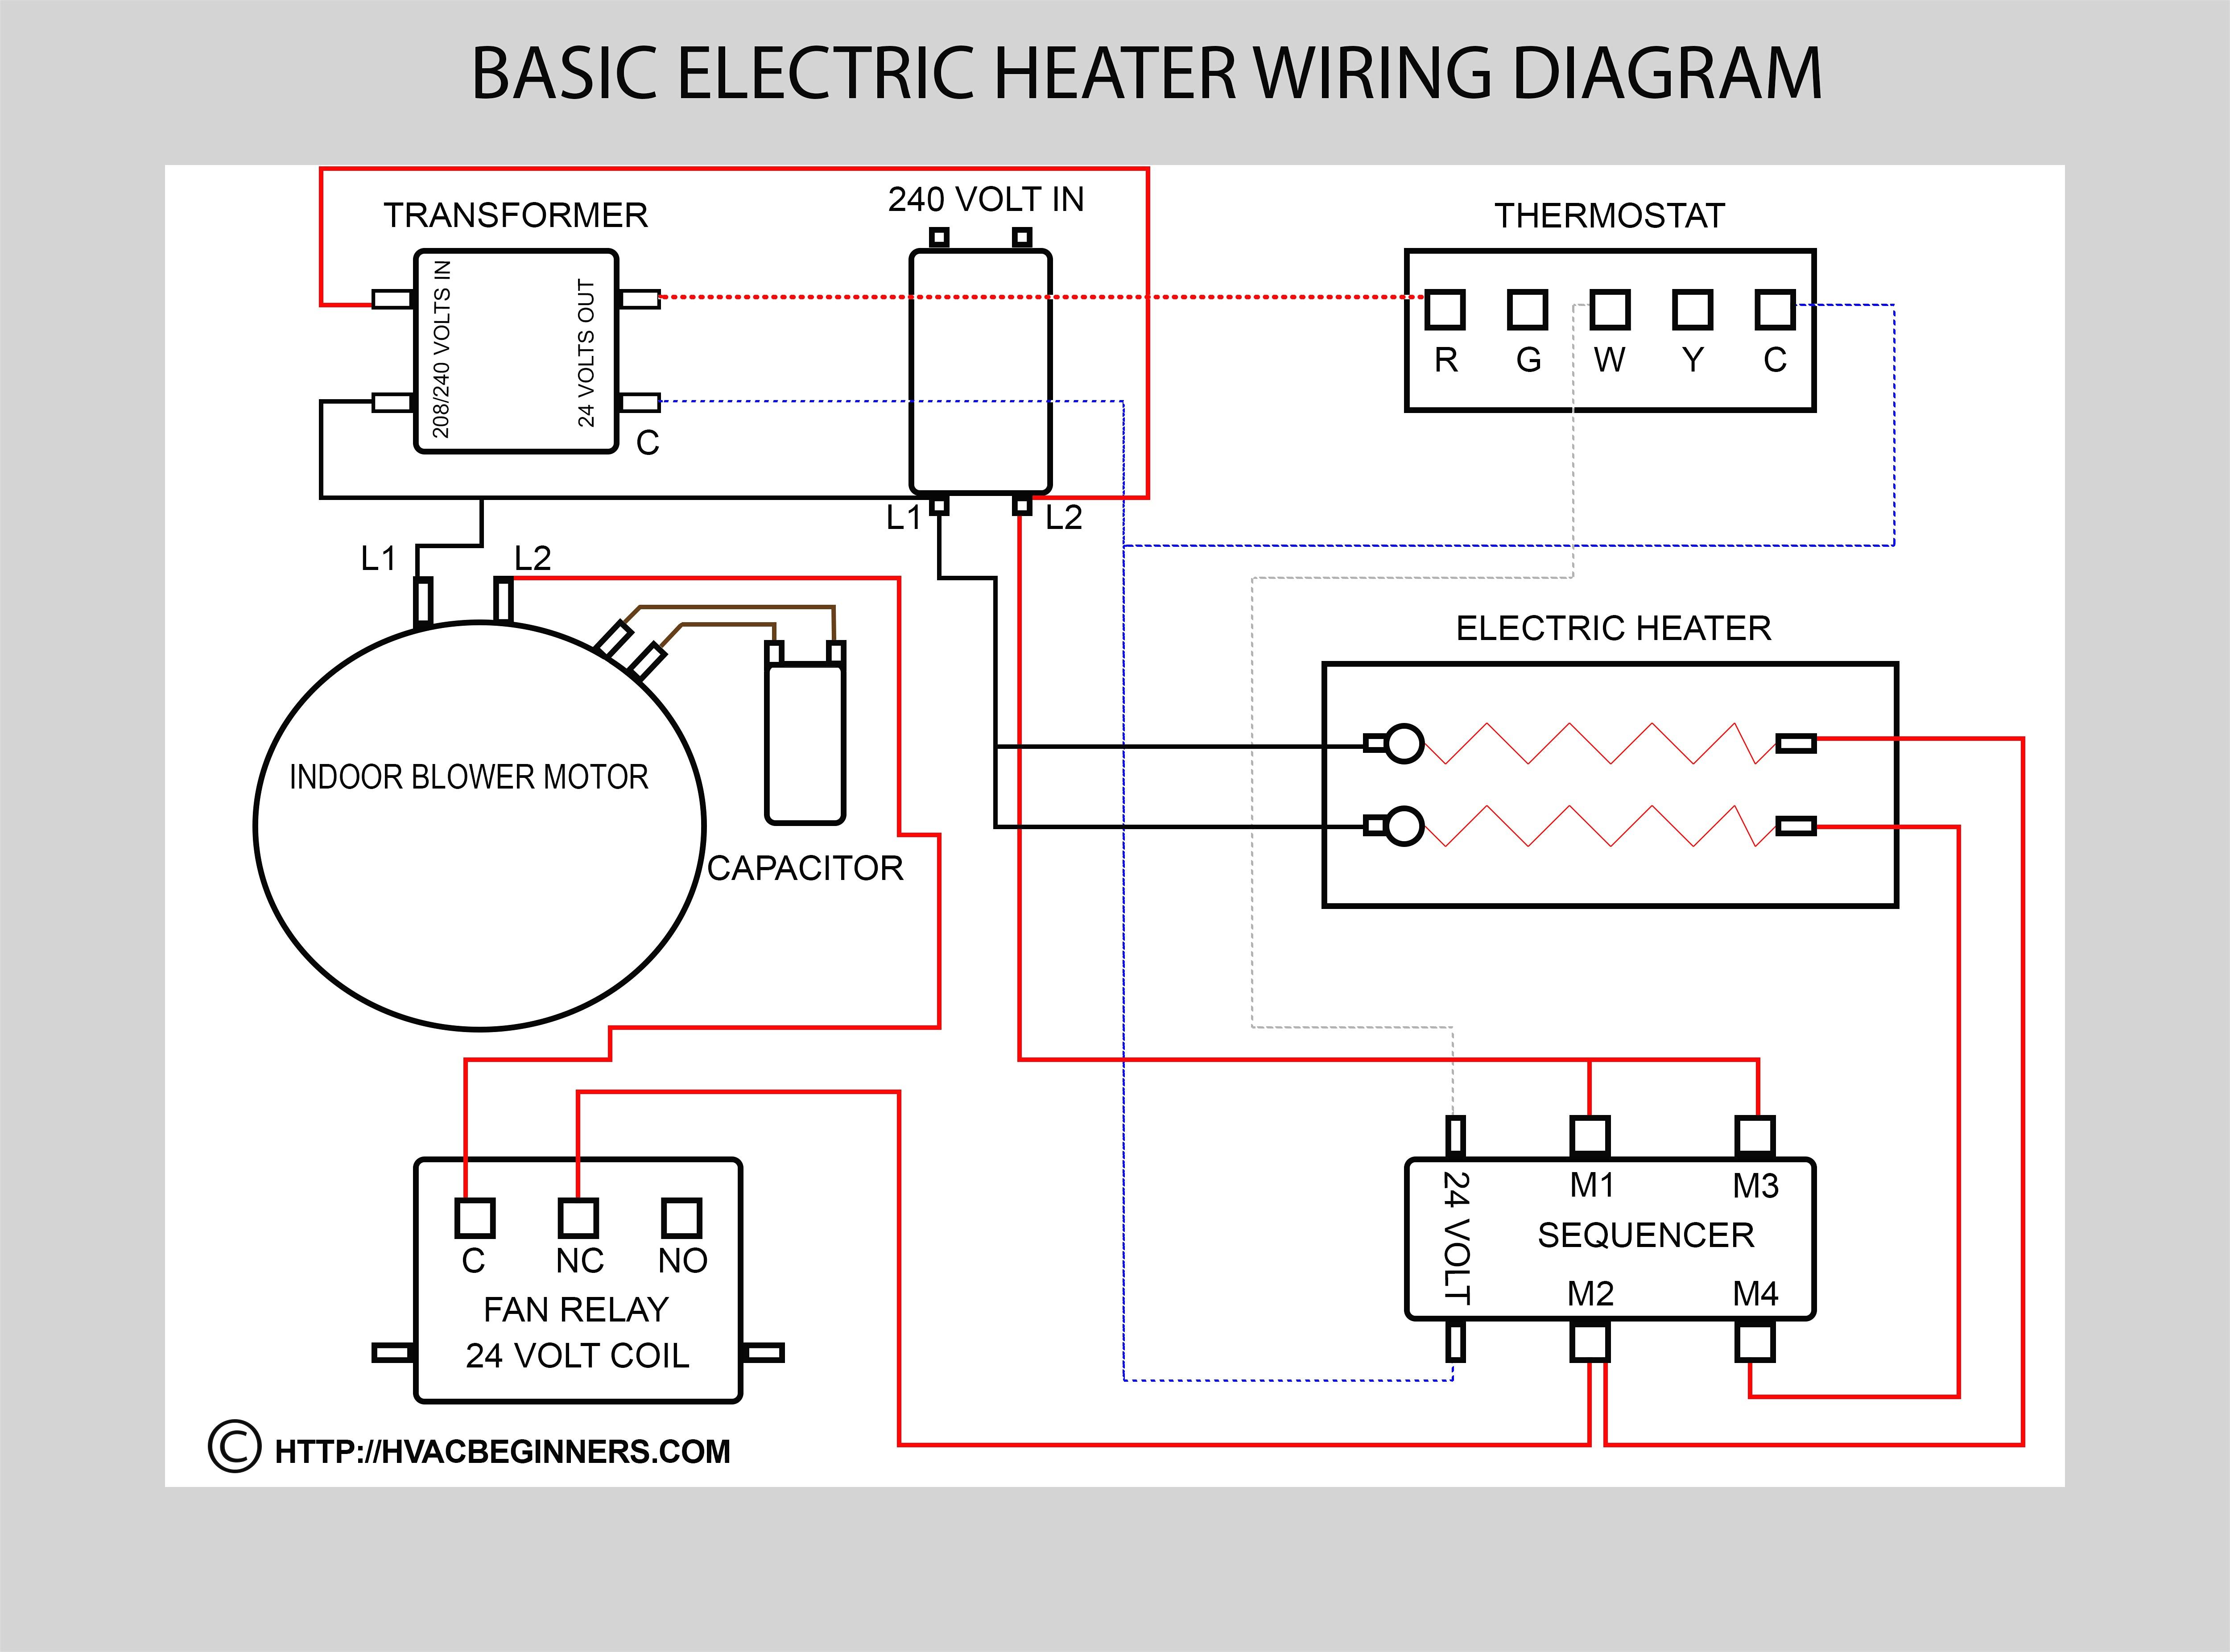 Ac Wire Diagram | Wiring Diagram - Electric Heater Wiring Diagram